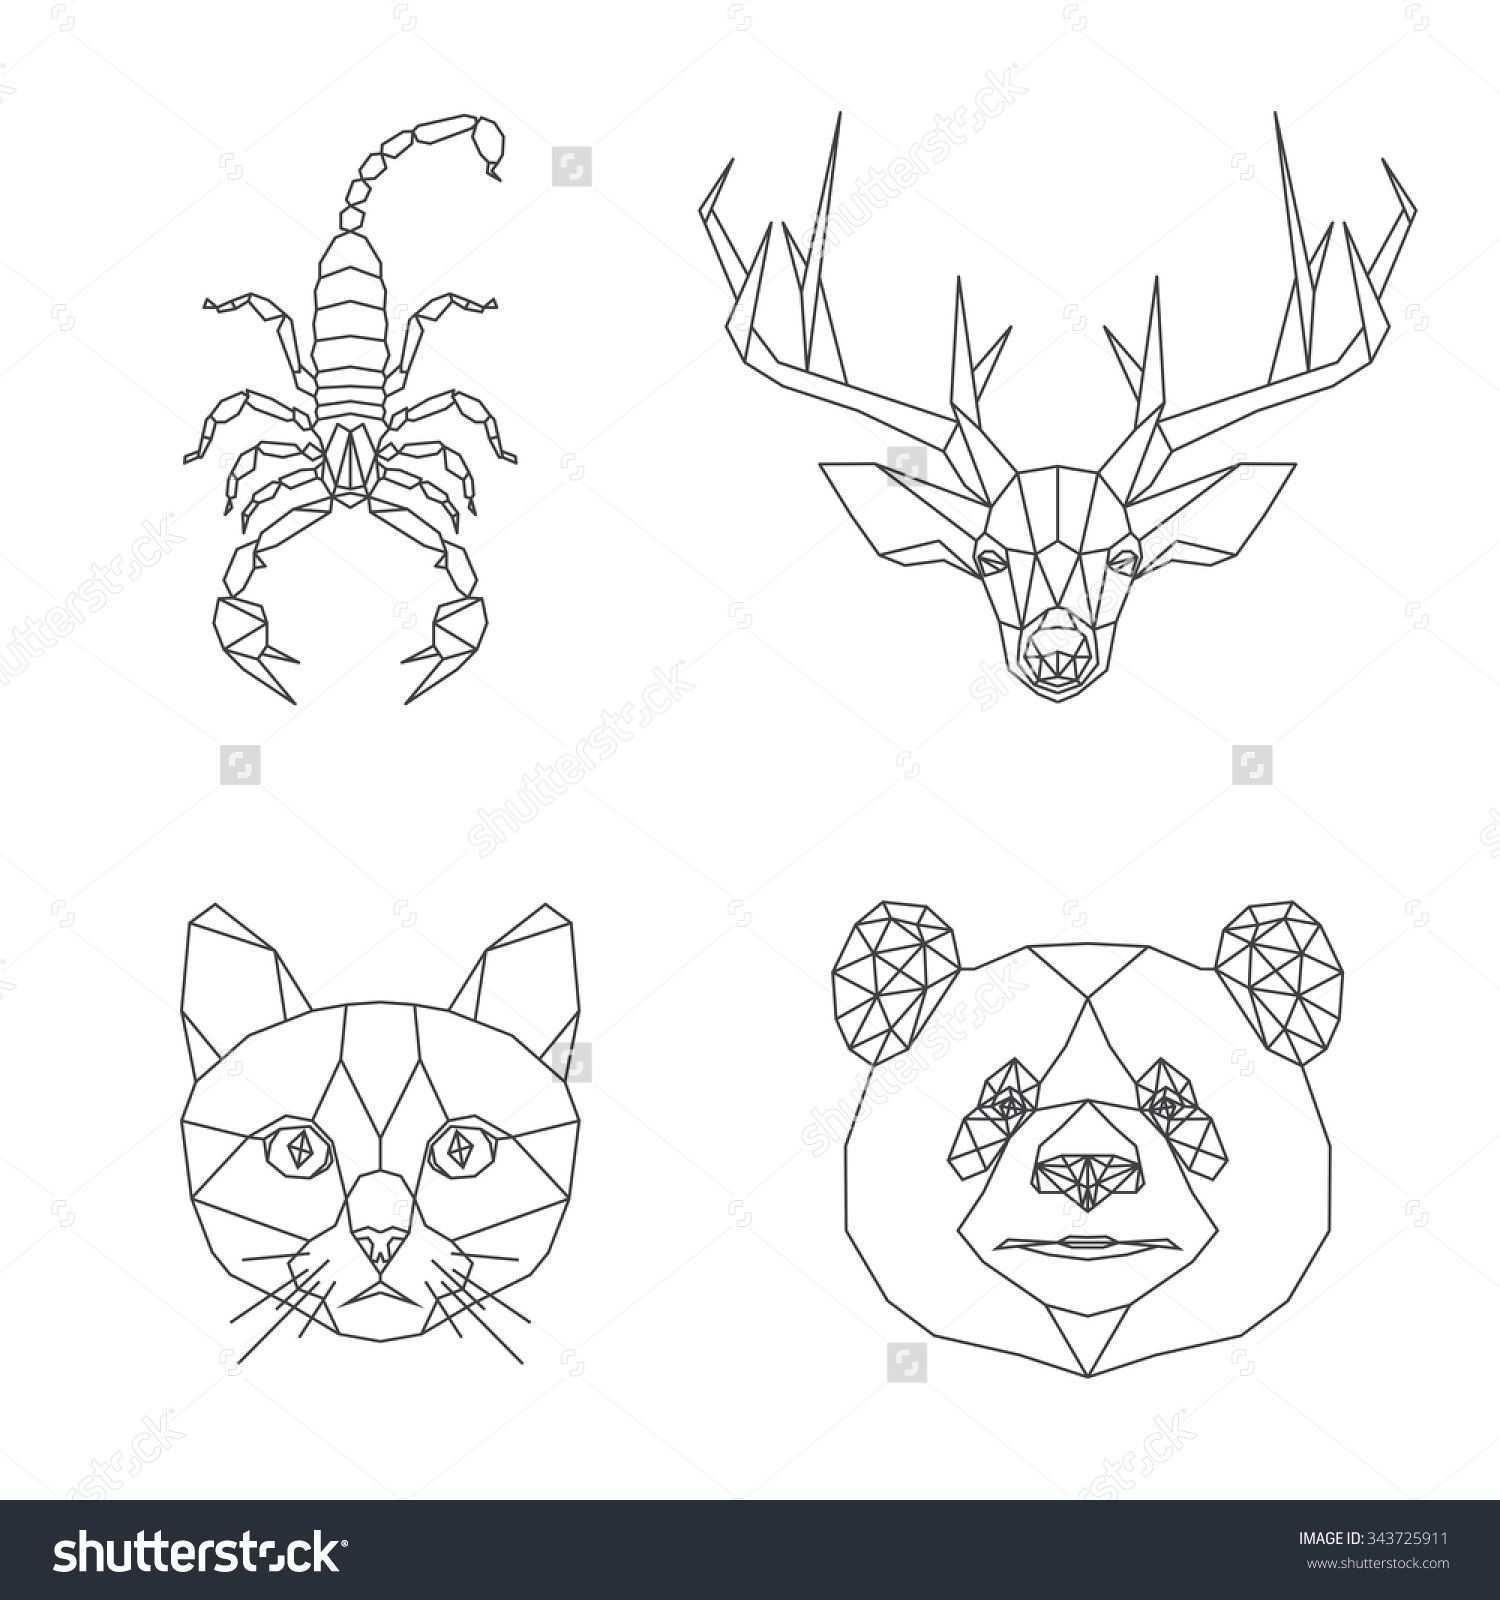 Pin By Carolina Angulo On Tattoo Geometric Animals Animal Illustration Geometric